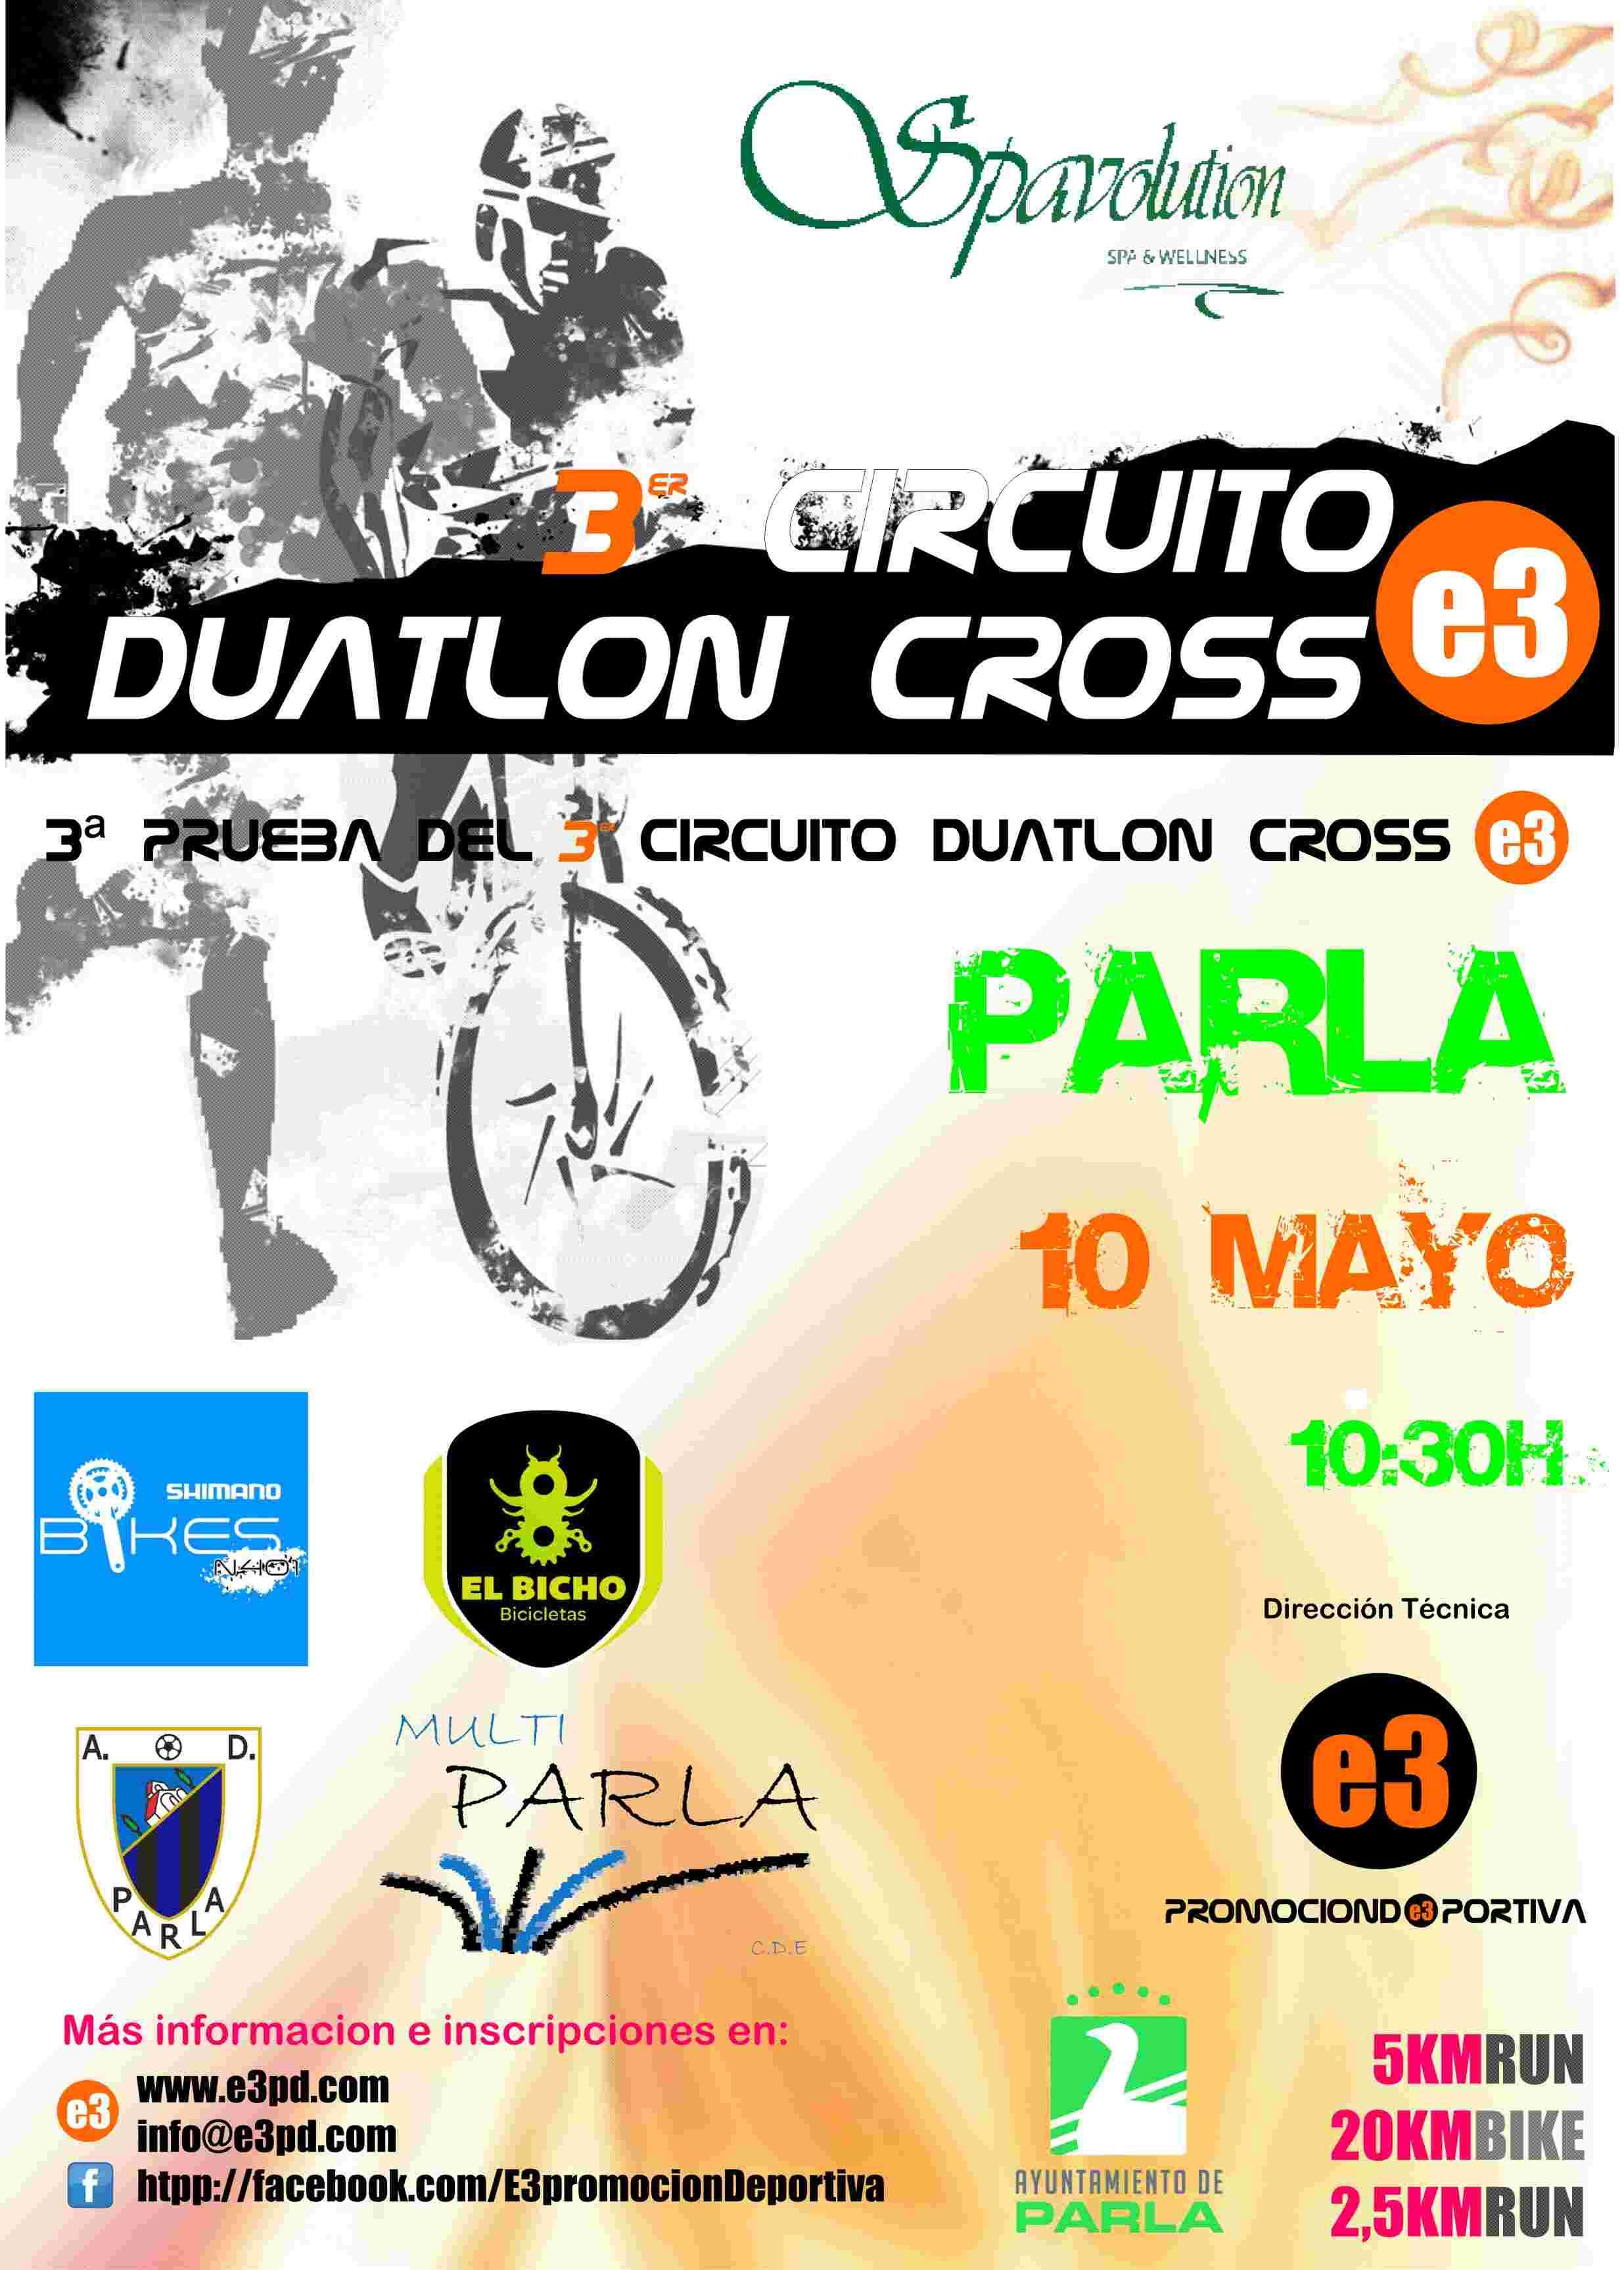 Resultados 3ª PRUEBA CIRCUITO DUATLON CROSS E3 - PARLA